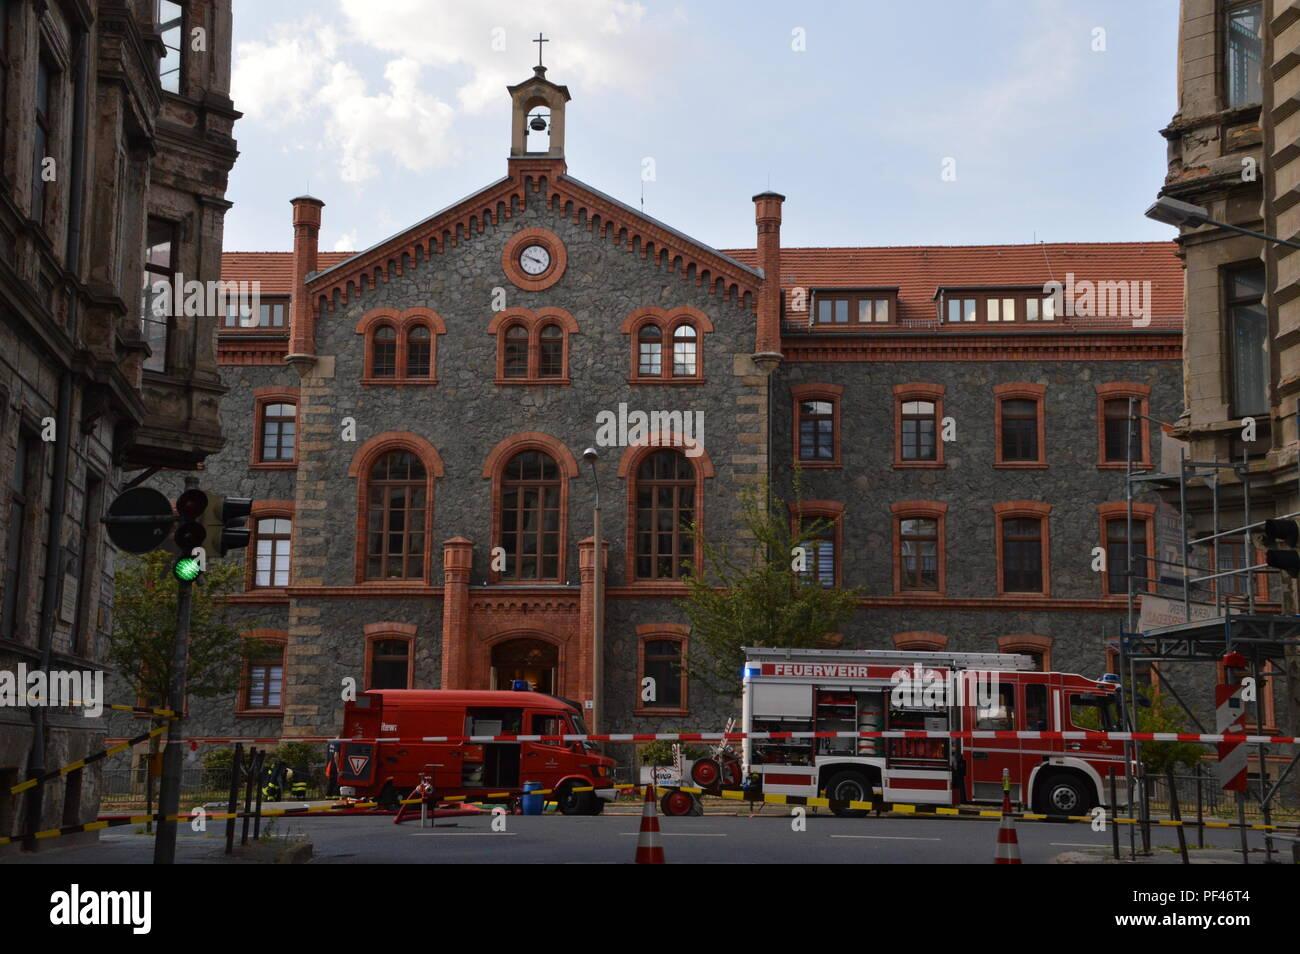 goerlitz saxony germany 2018 august: awo altenheim chemie unfall photo wehnert Stock Photo